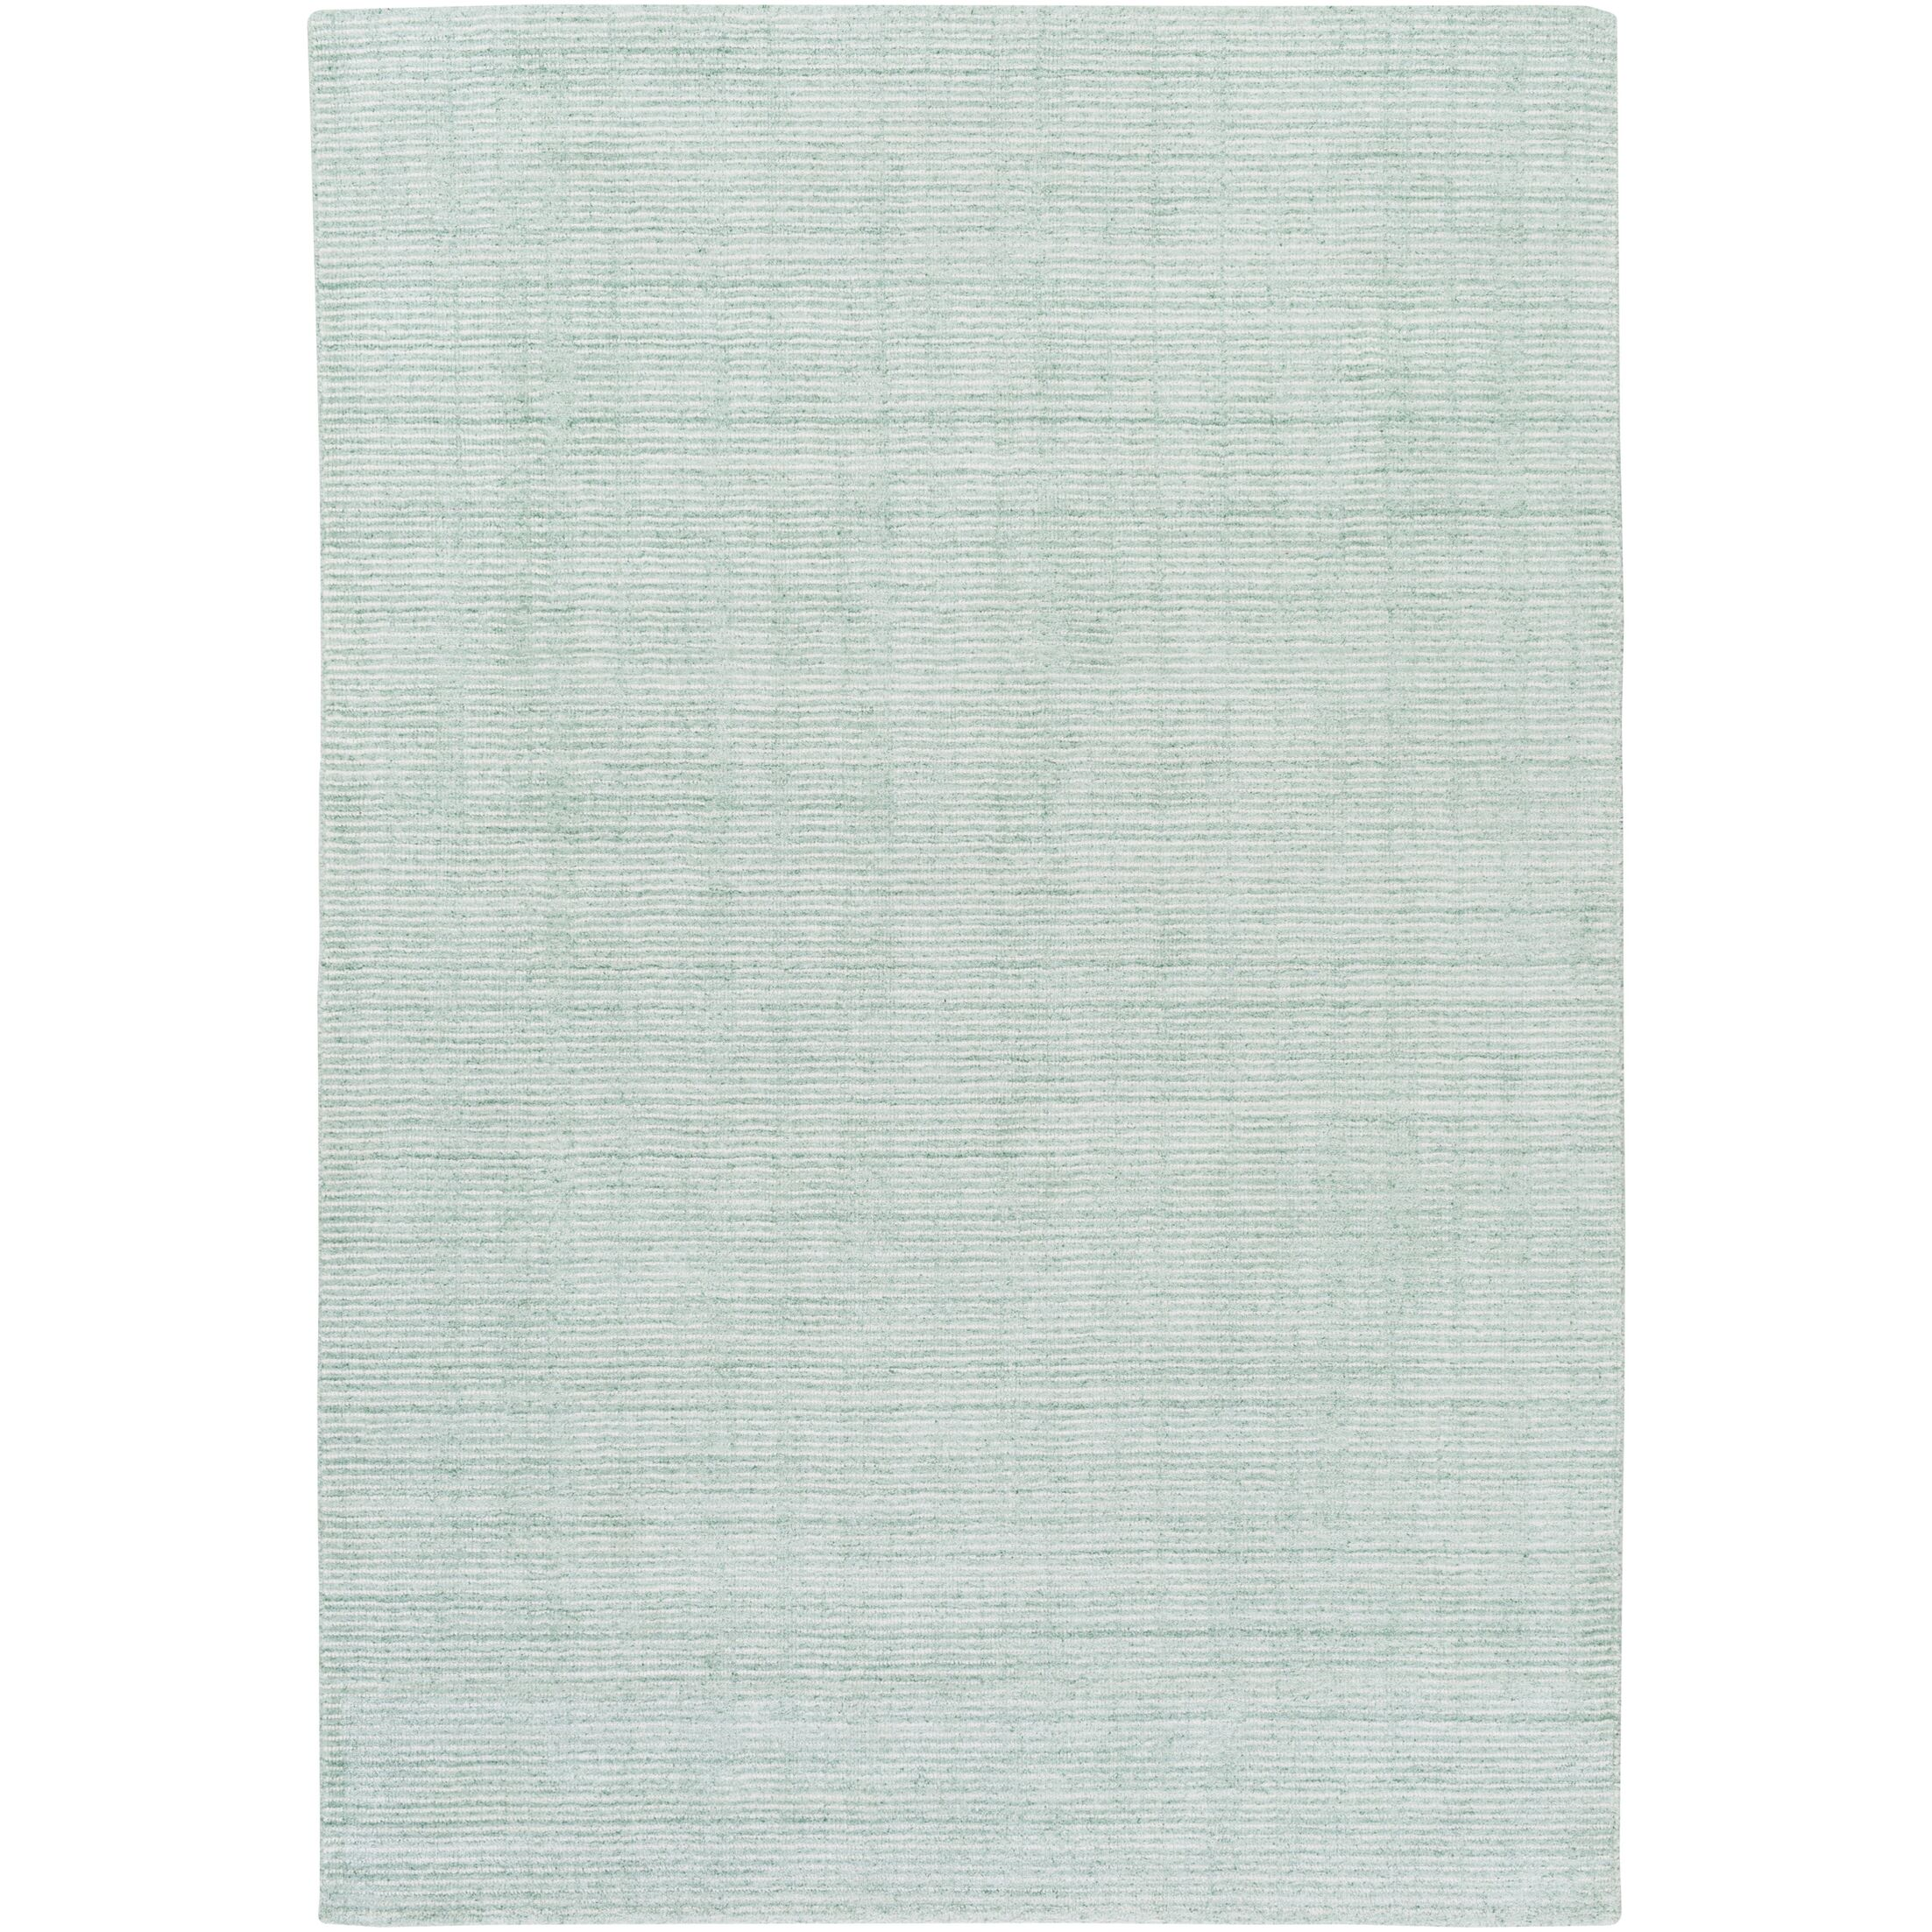 Chesterbrook Hand-Loomed Sea Foam Area Rug Rug Size: Rectangle 4' x 6'